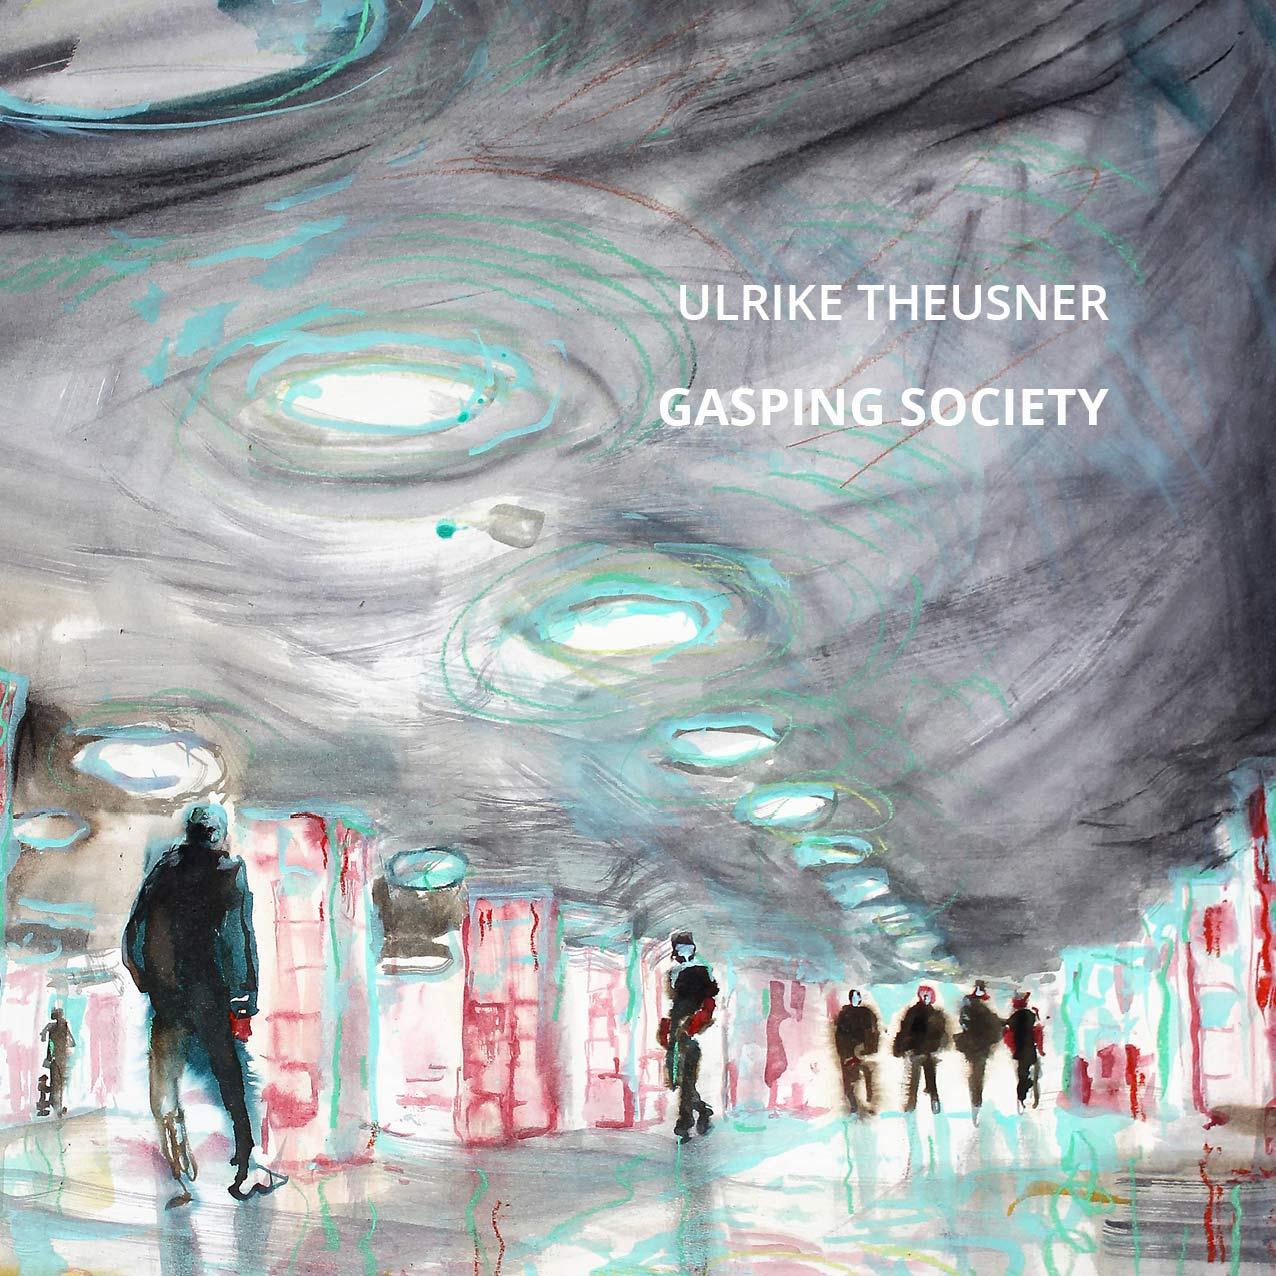 gasping-society-ulrike-theusner-jalara-verlag-11-2016-webformat